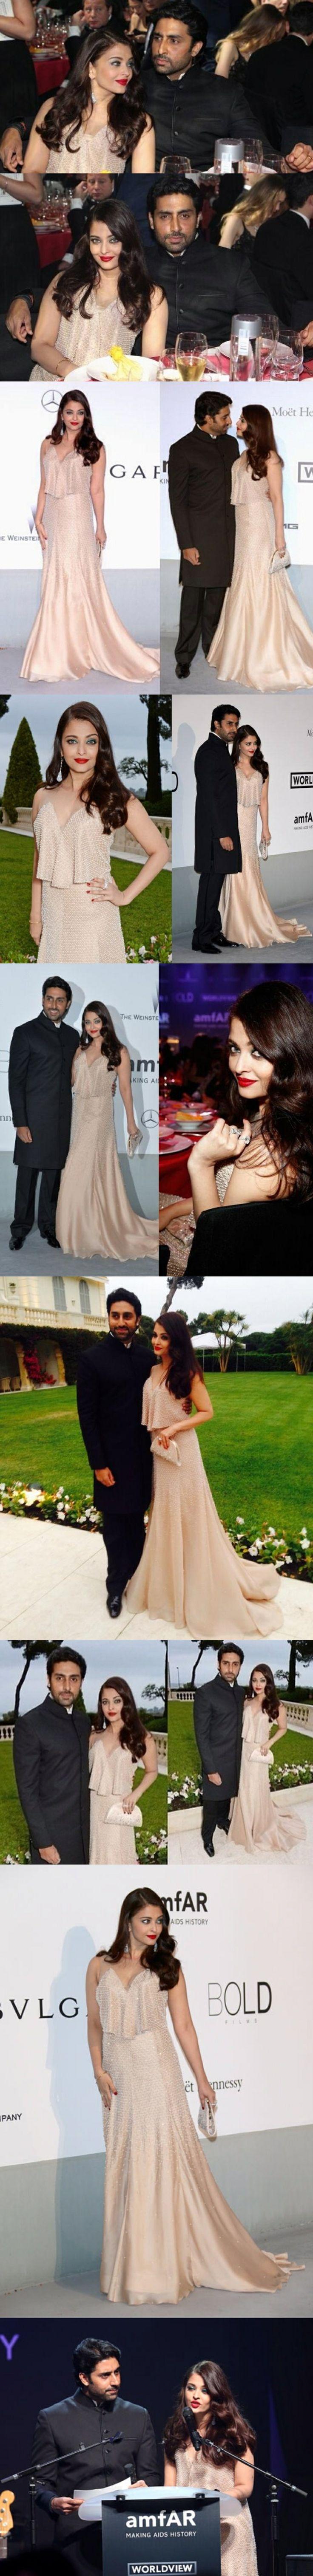 Cannes 2014: Aishwarya Rai Bachchan at amfAR gala with husband Abhishek.